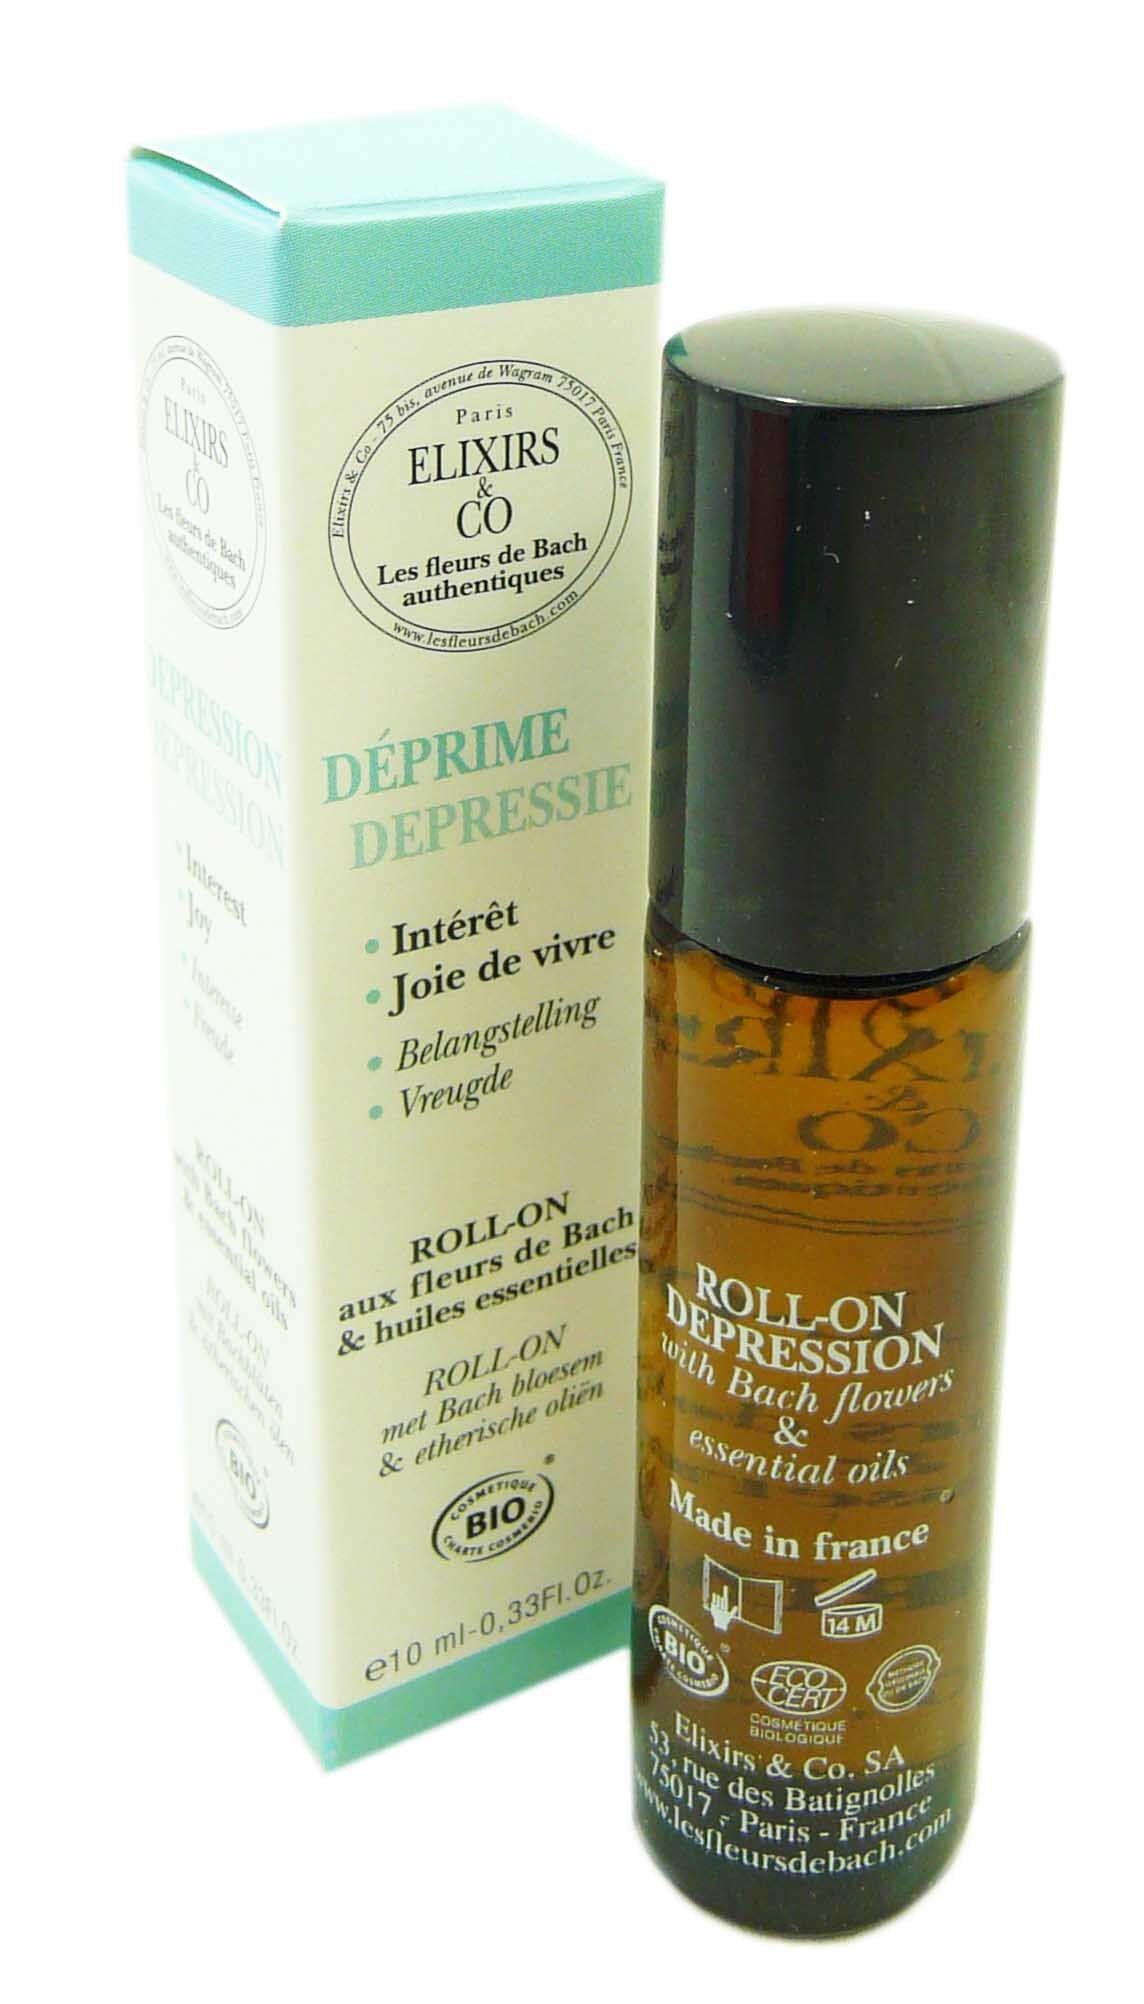 ELIXIRS & CO Elixir & co deprime fleurs de bach roll-on 10ml